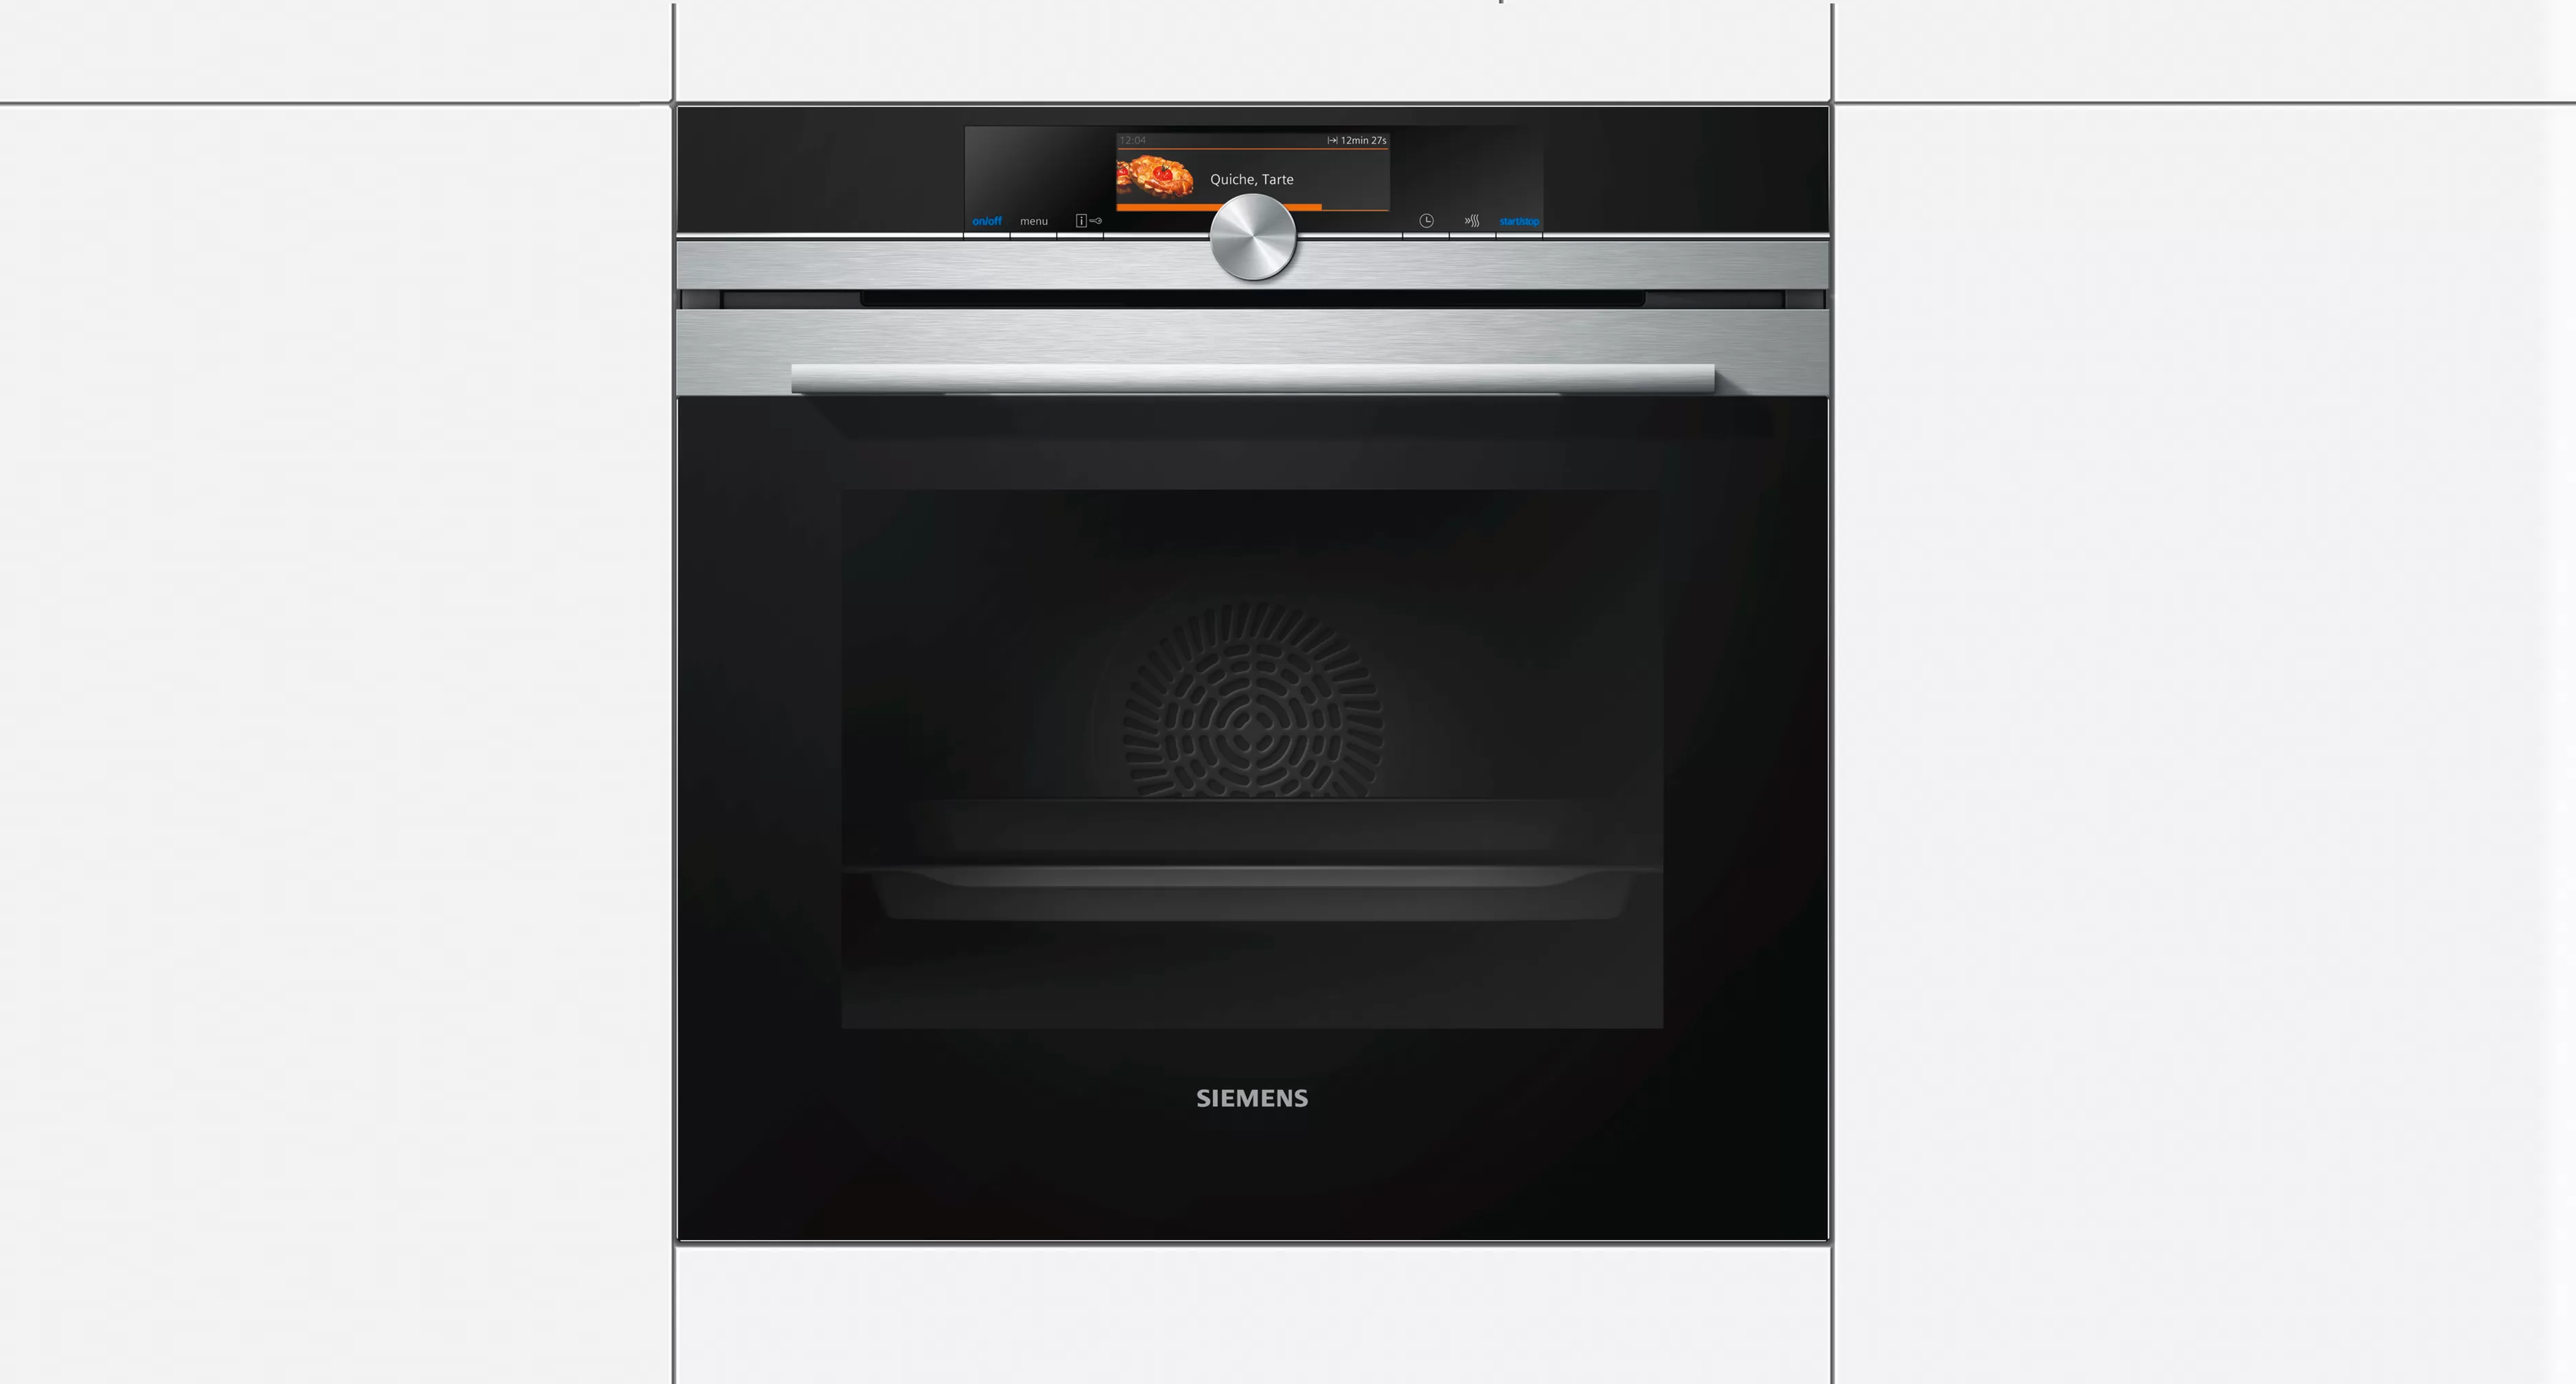 Siemens IQ700 Oven